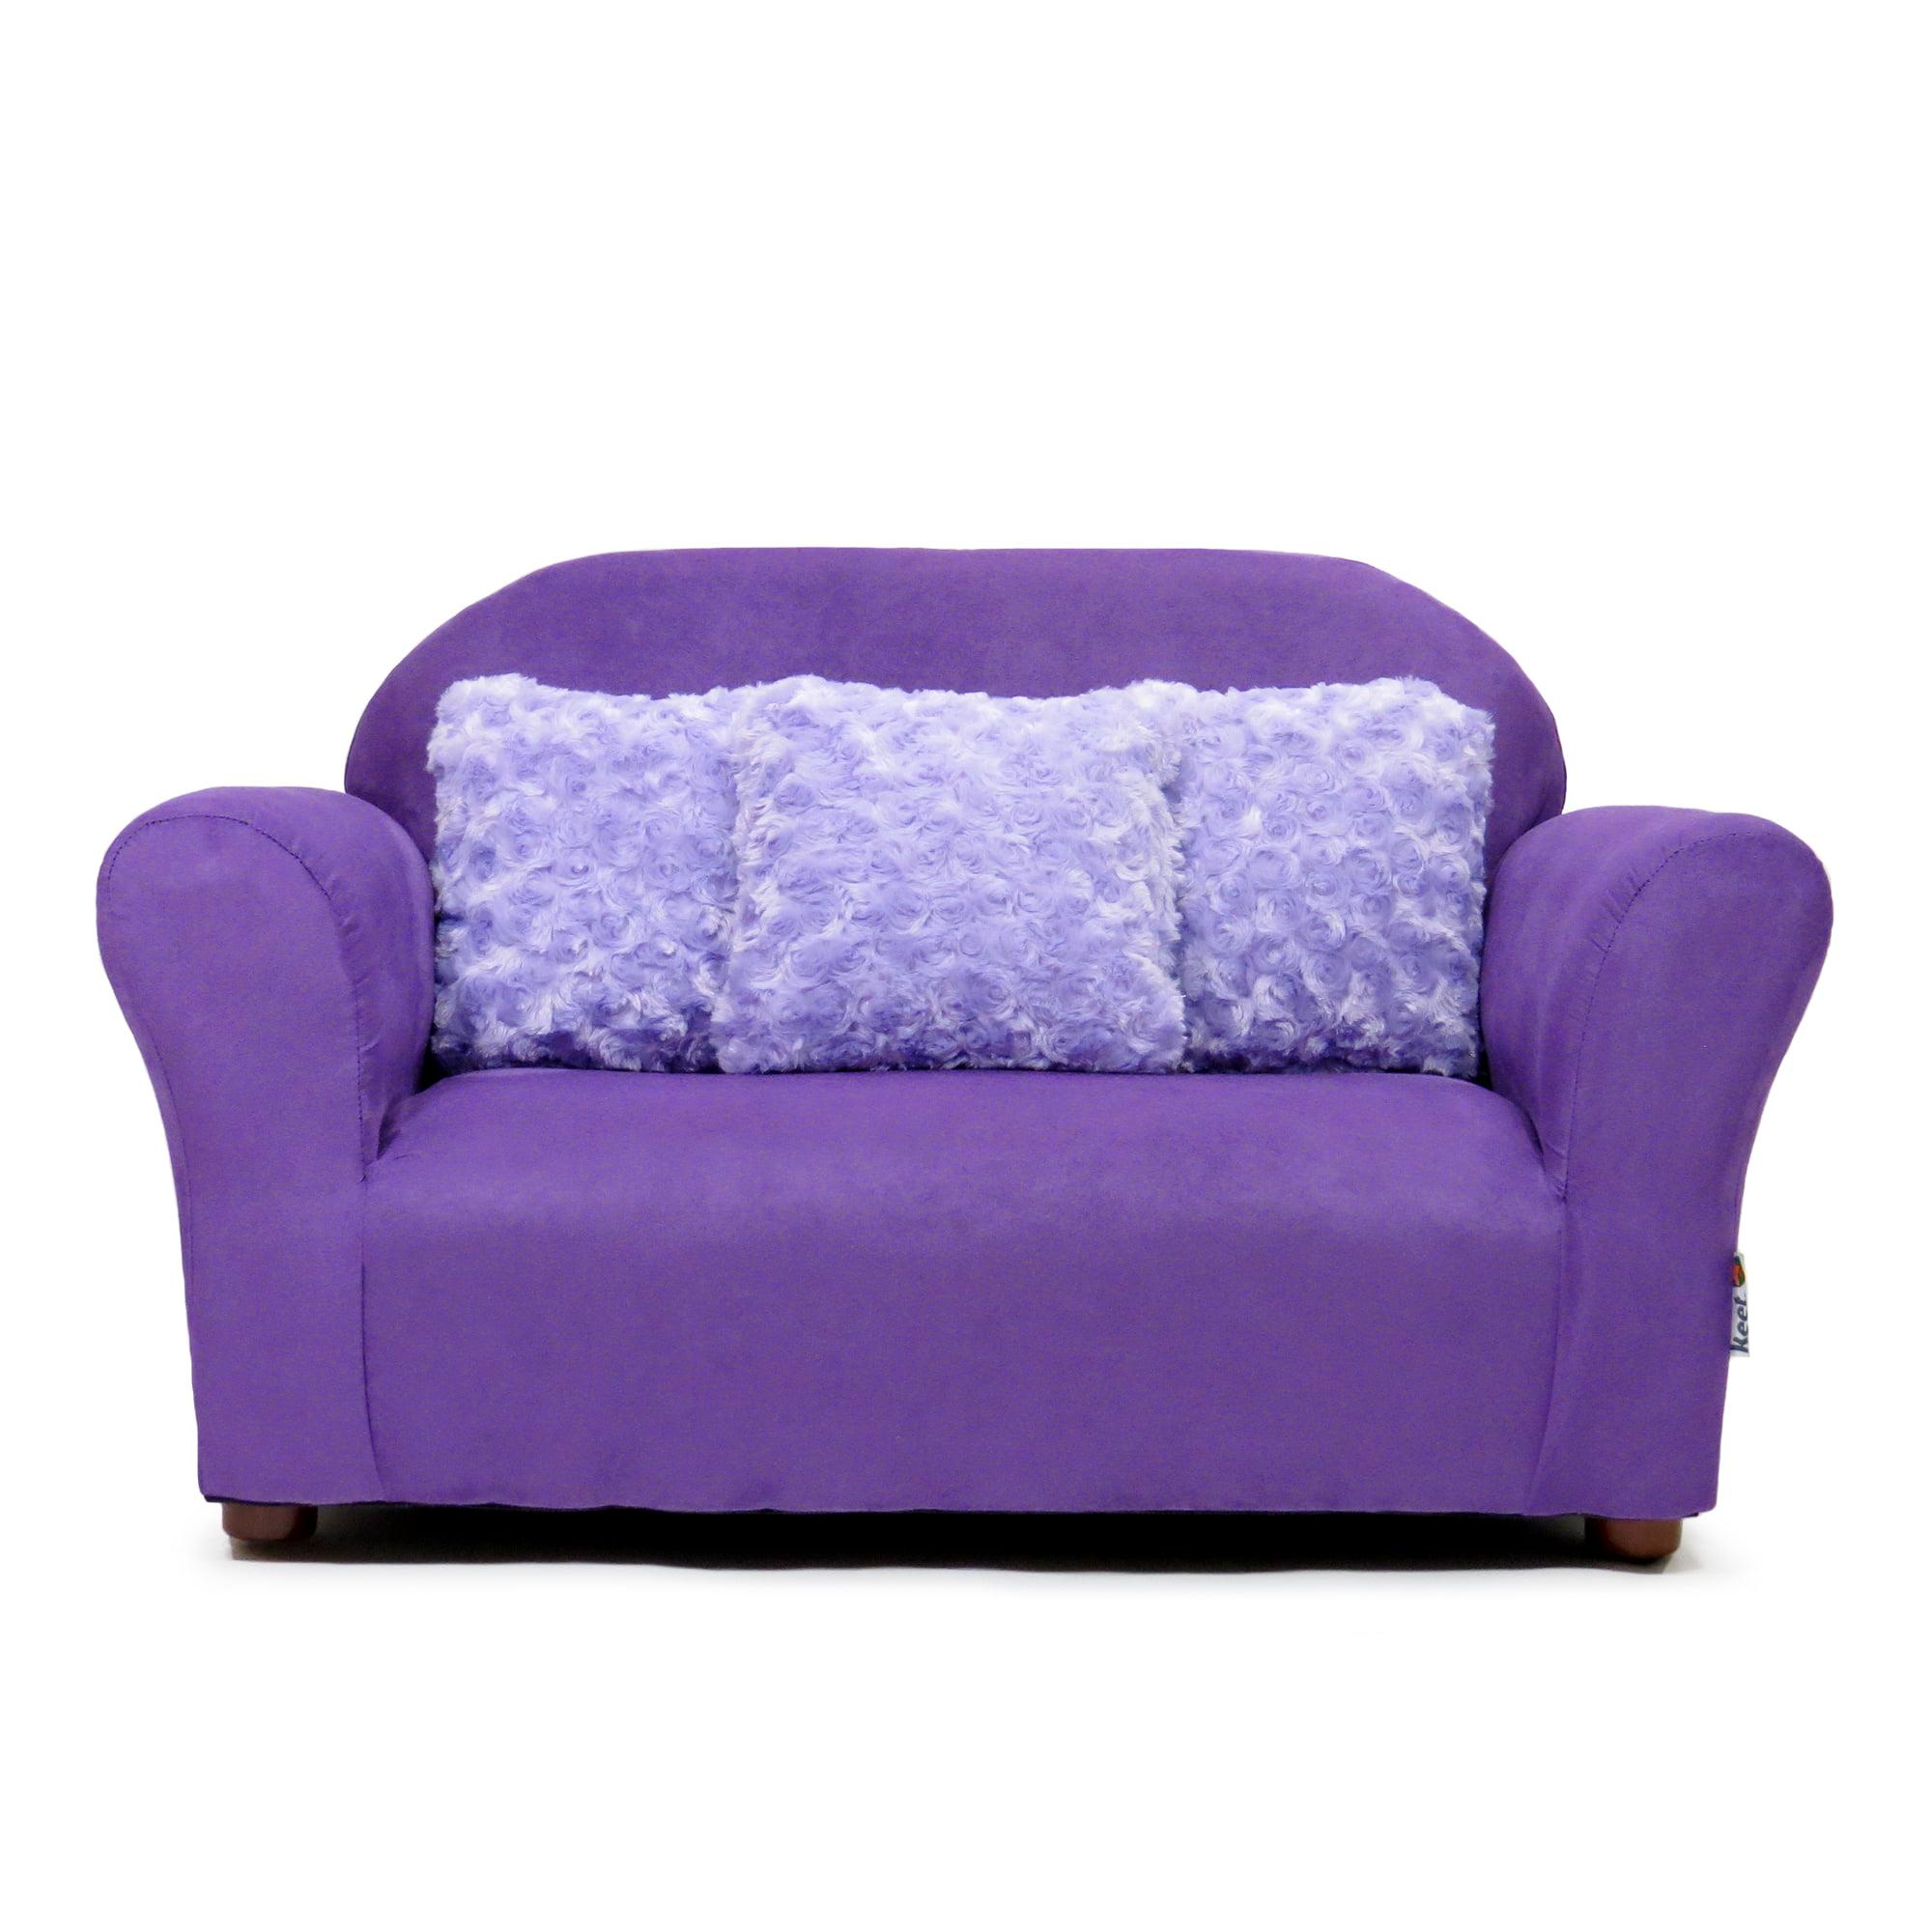 Plush Keet Children S Sofa Purple With